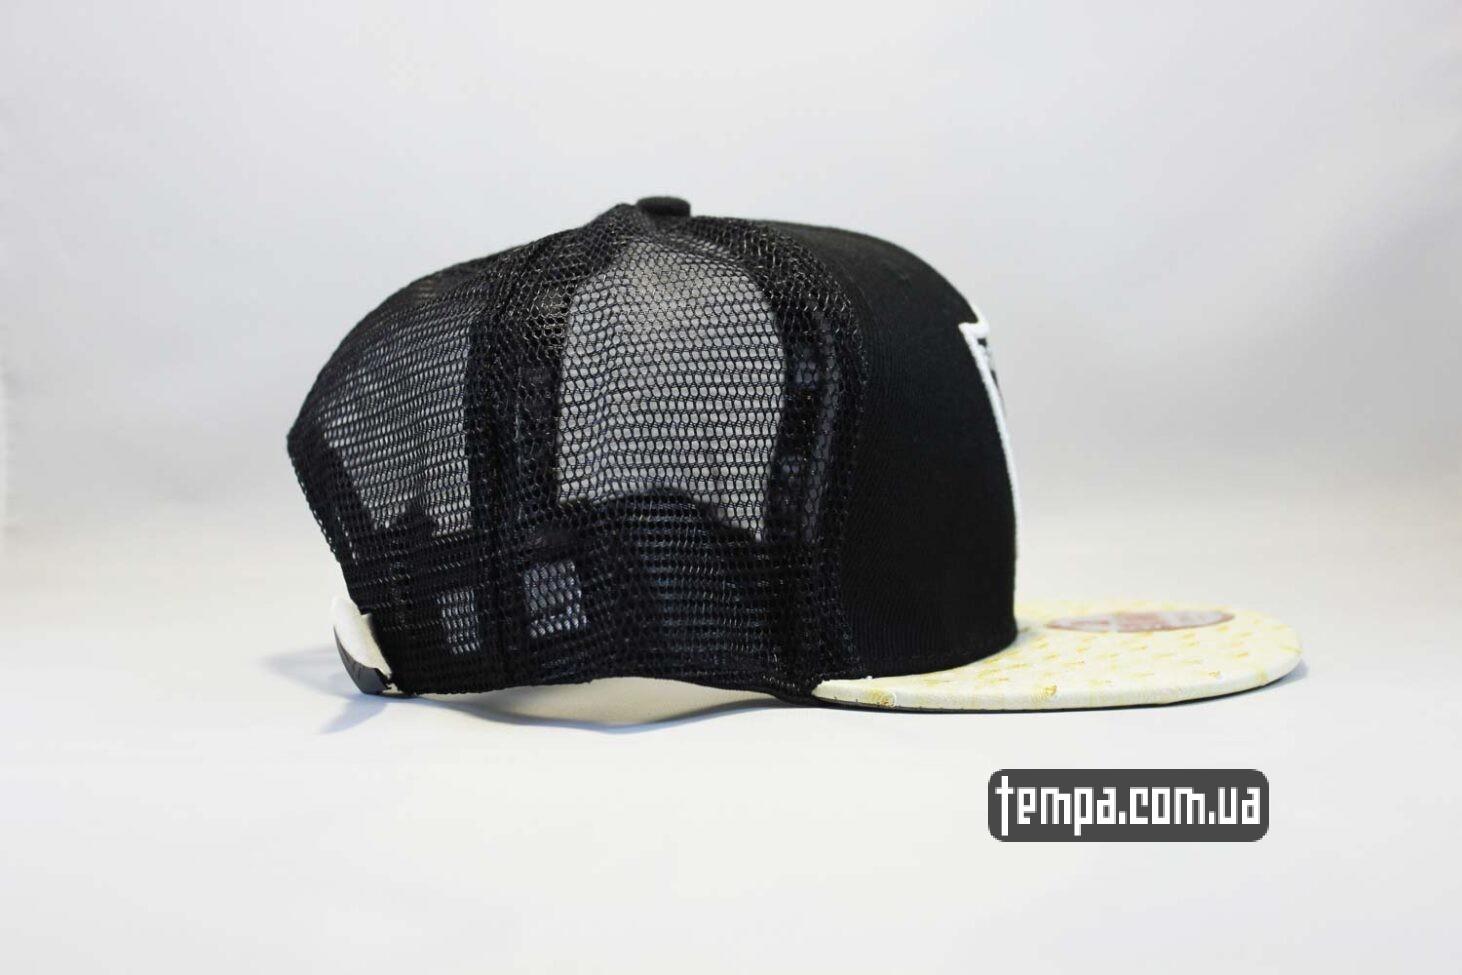 райдерс одежда купить кепка Trucker Snapback Raiders New Era 9fifty сетка